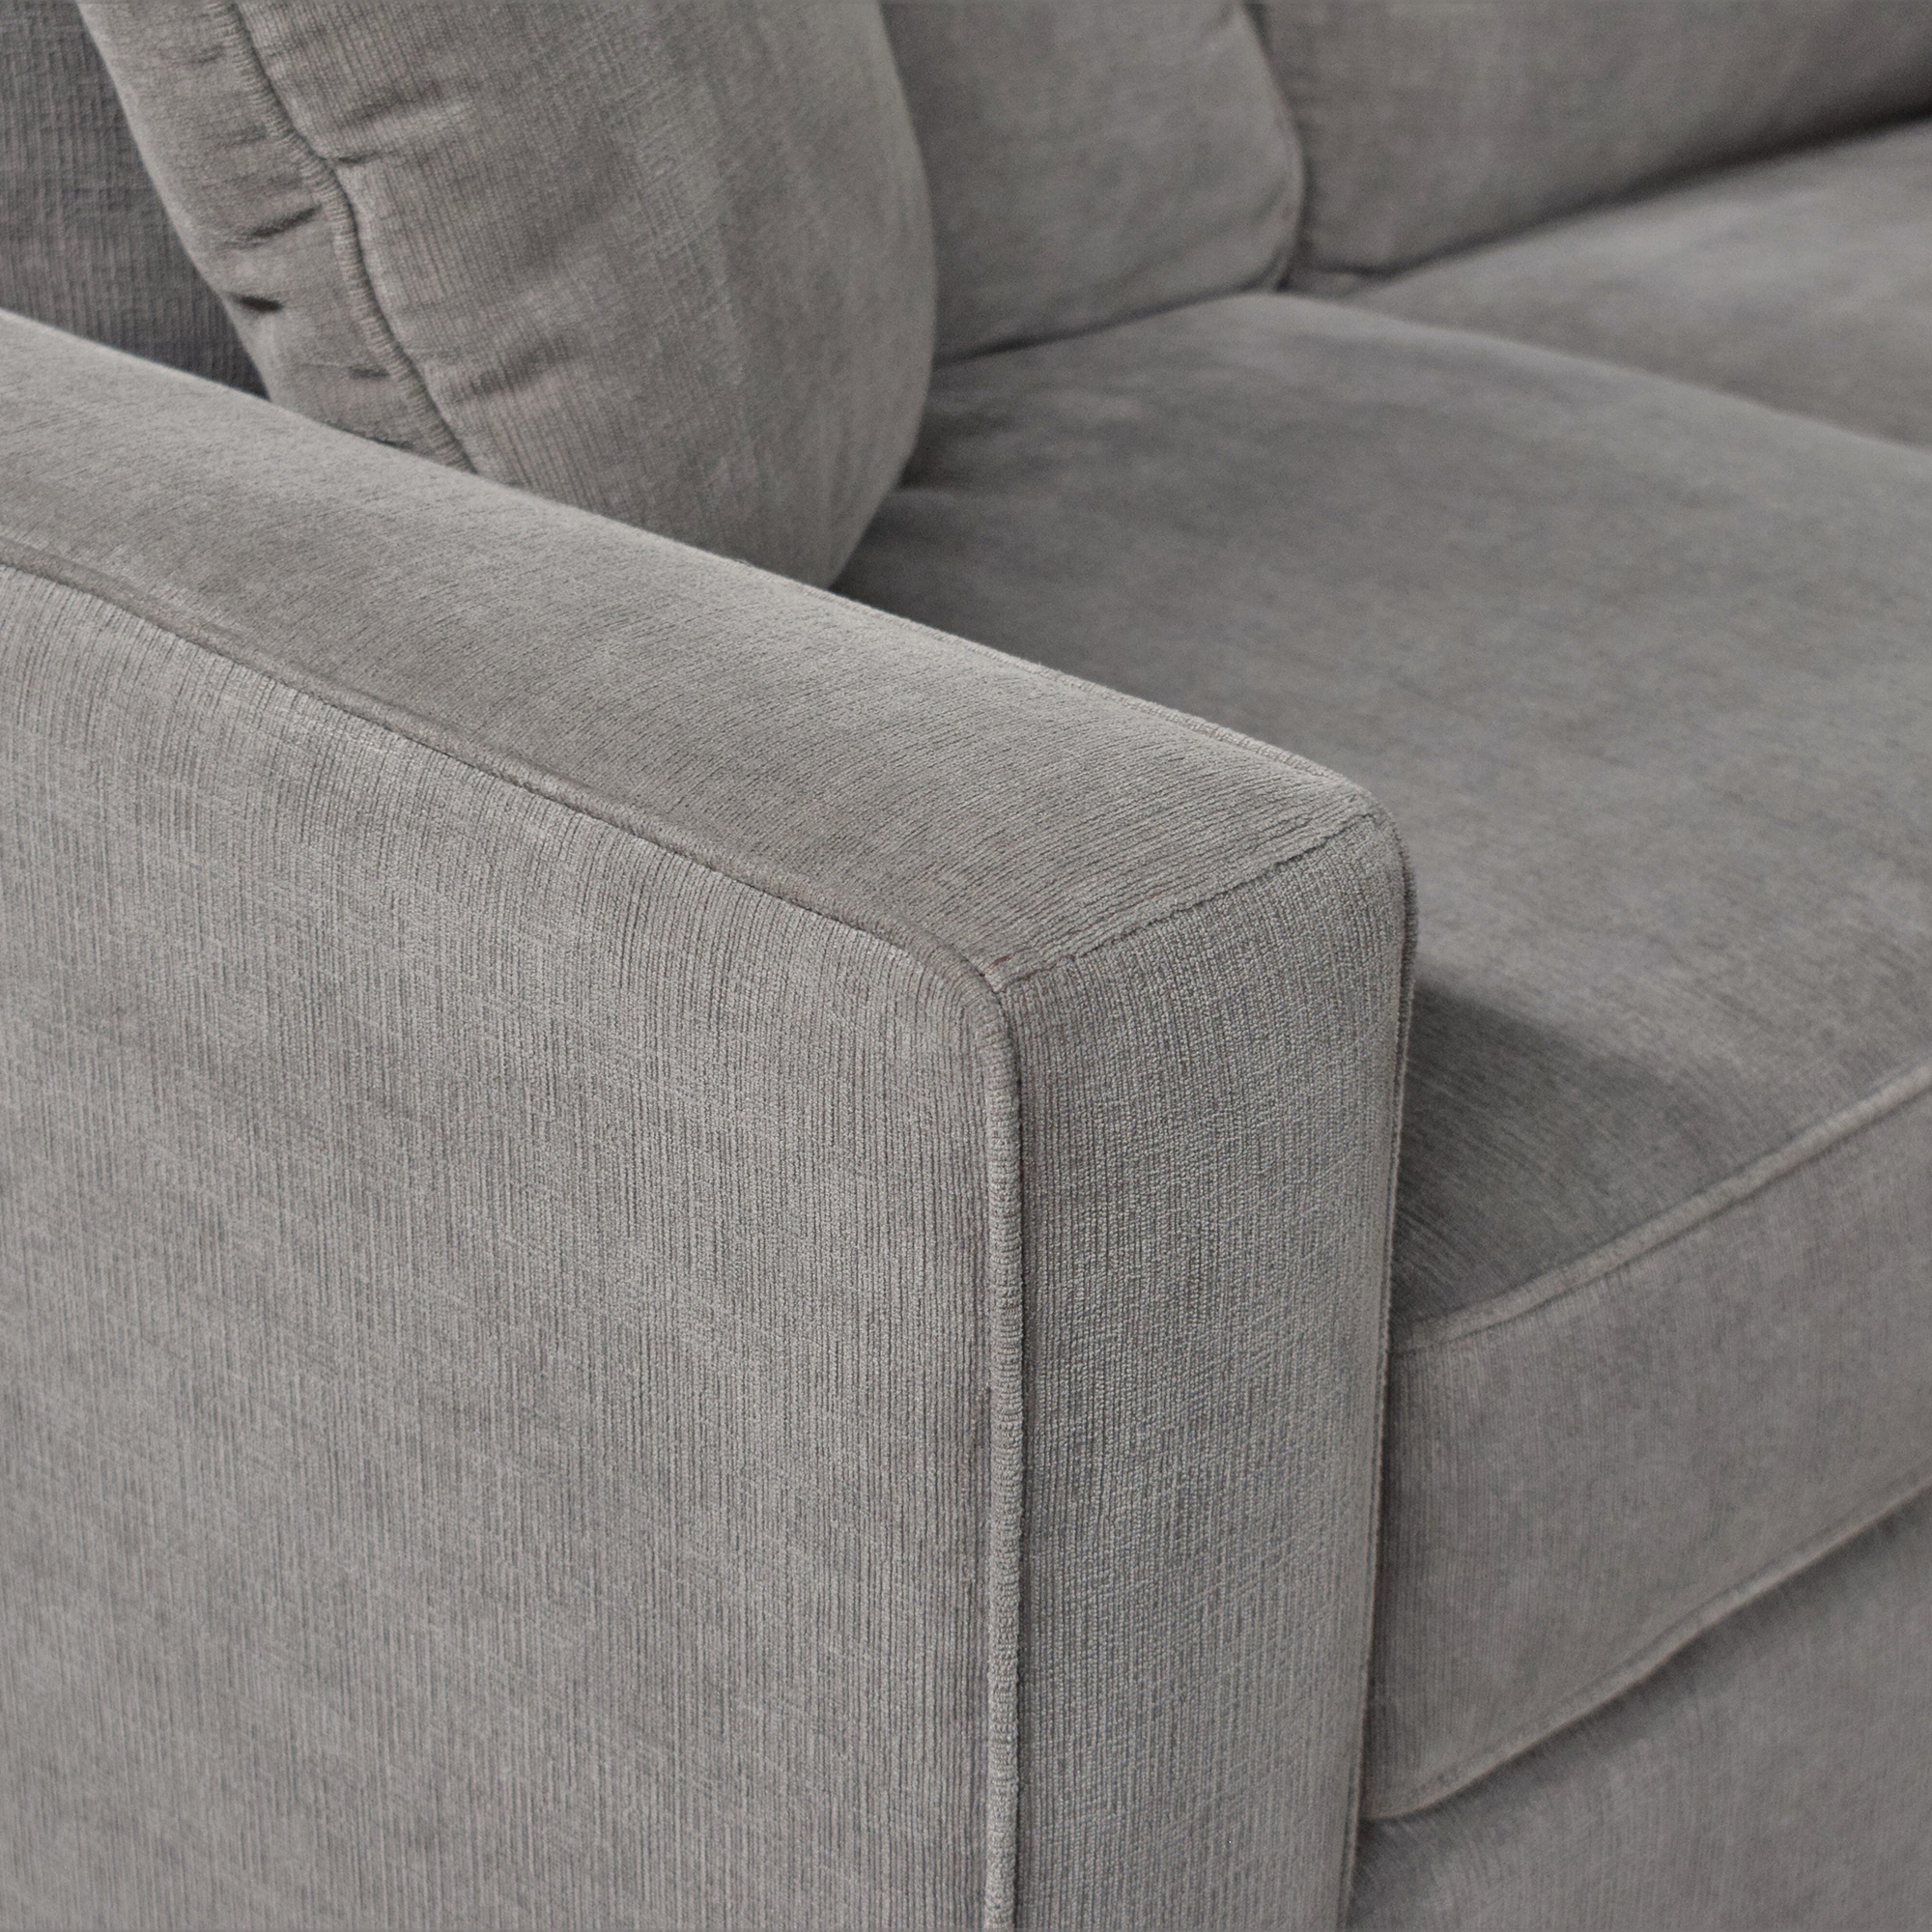 shop Macy's Macy's U-Shaped Chaise Sectional Sofa online